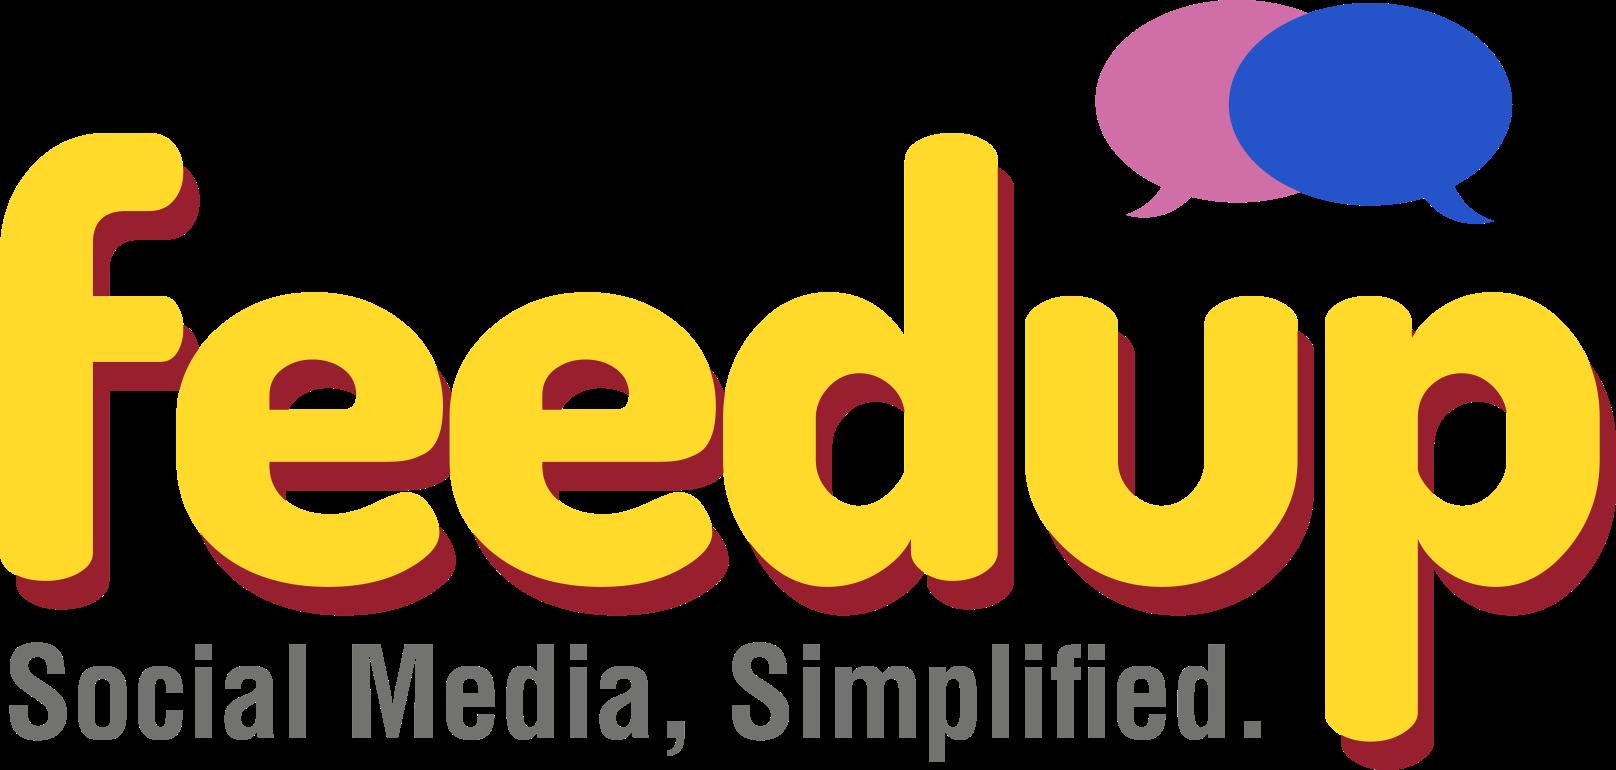 Feedup Social media for small business